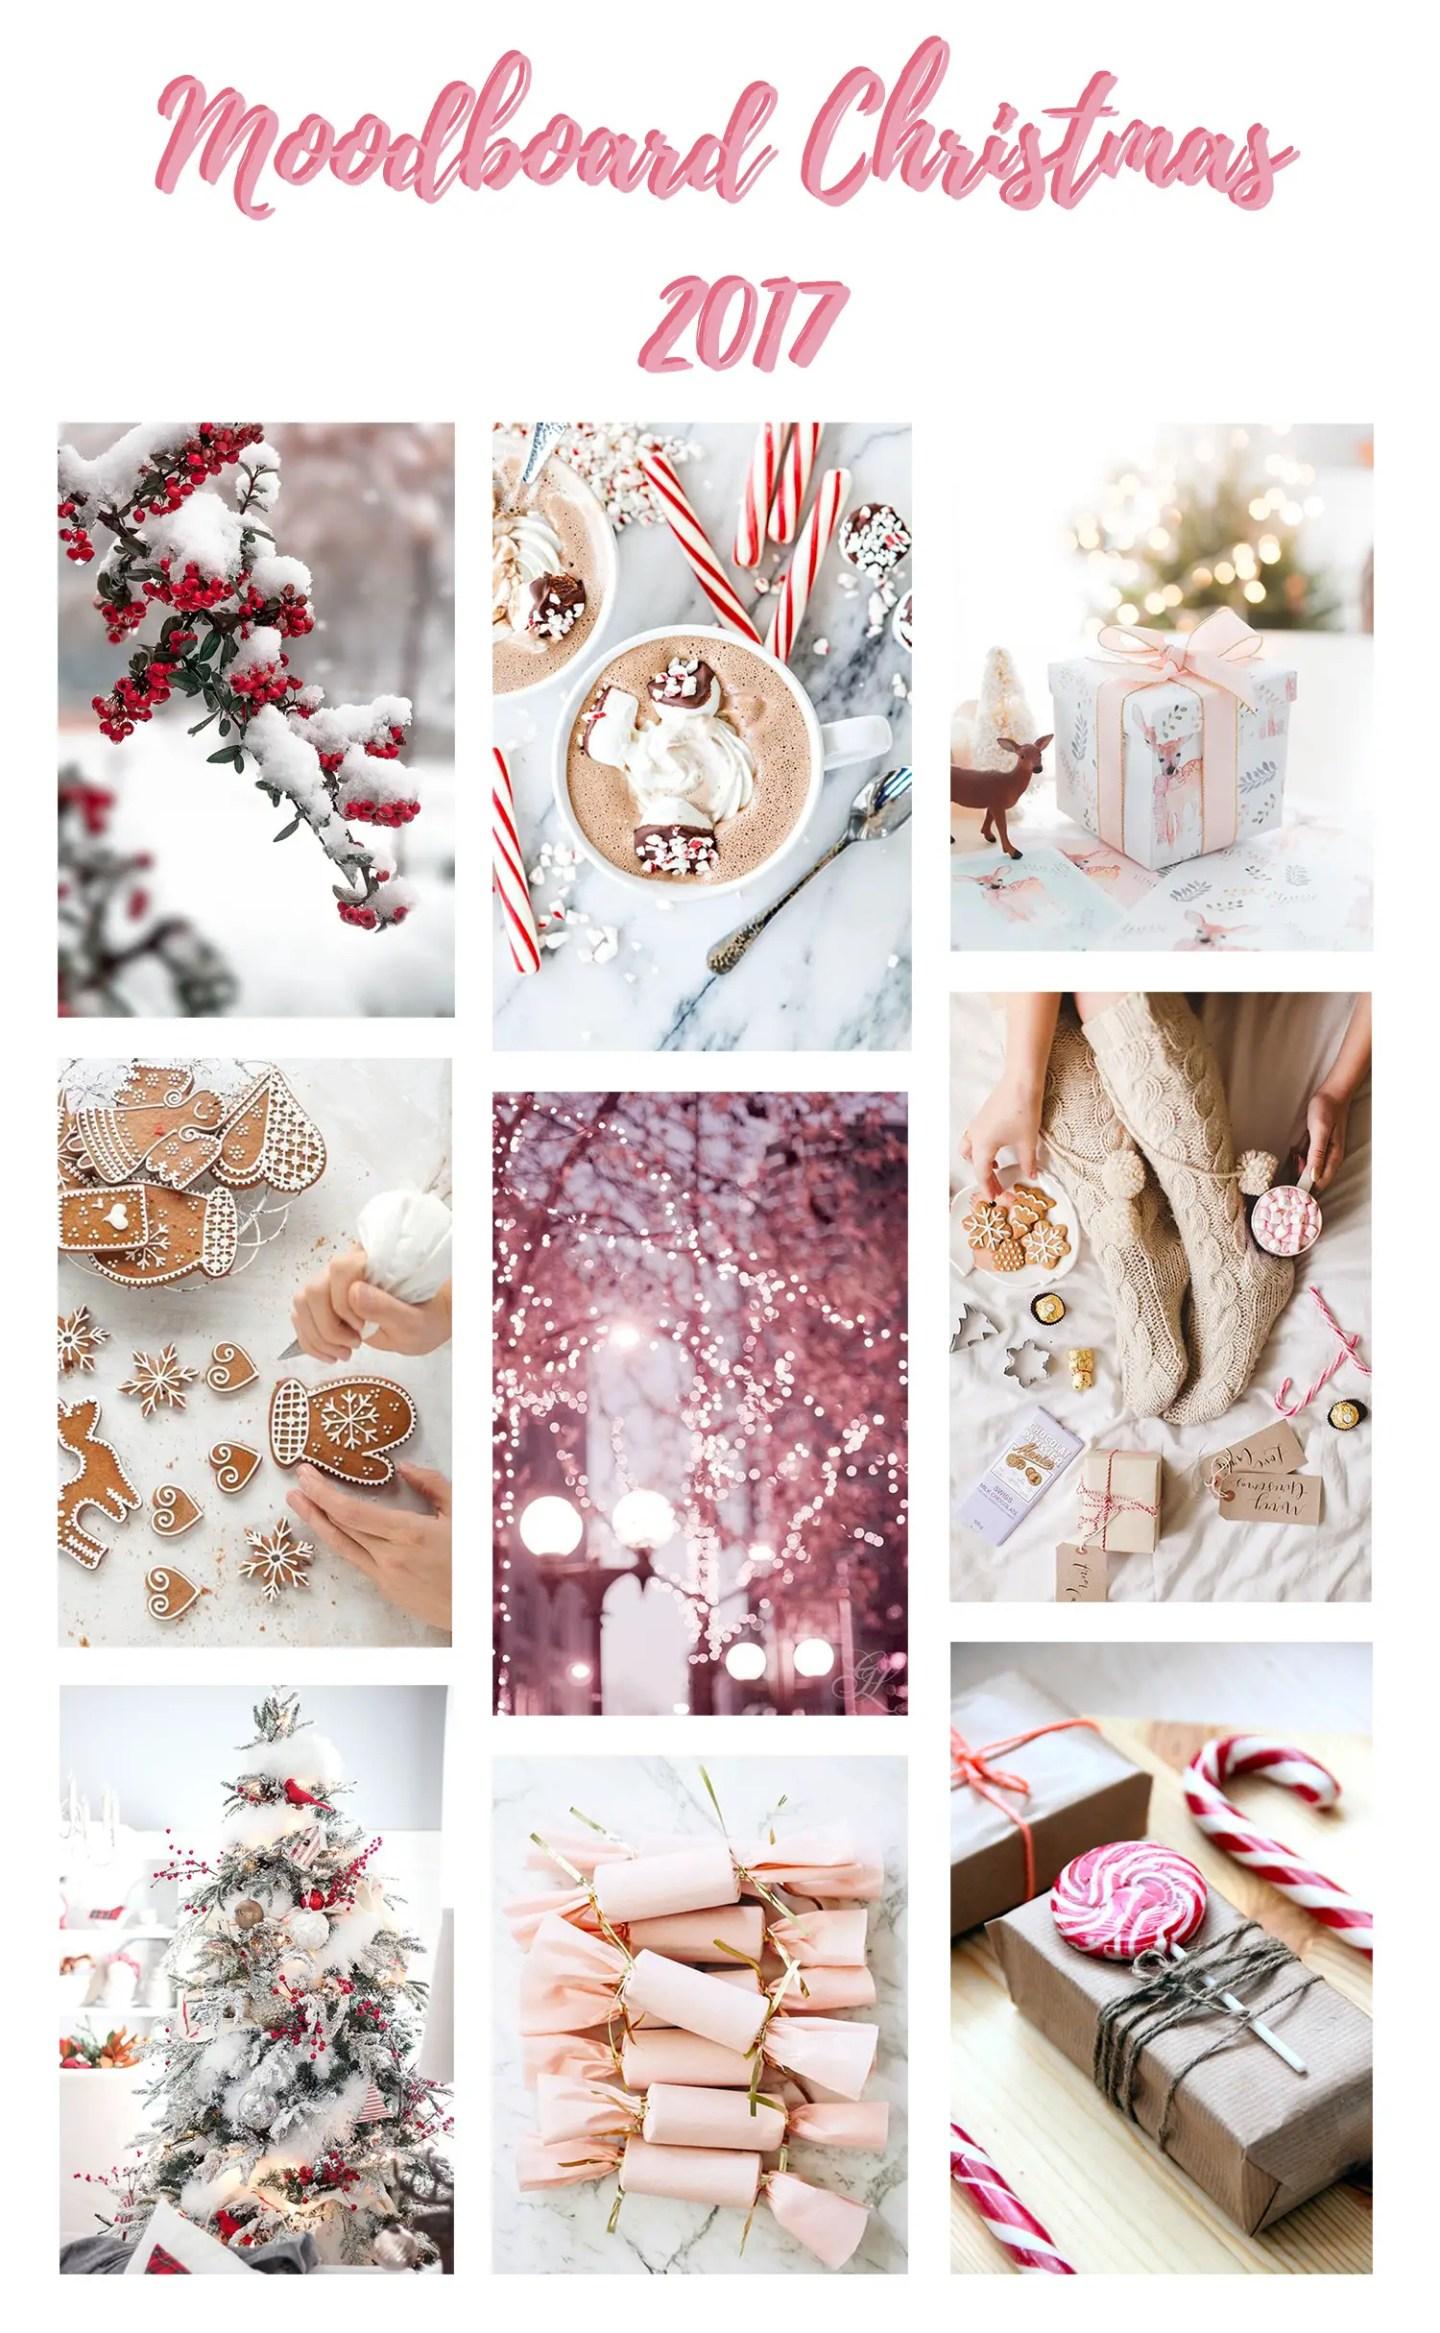 Moodboard Noël - Christmas